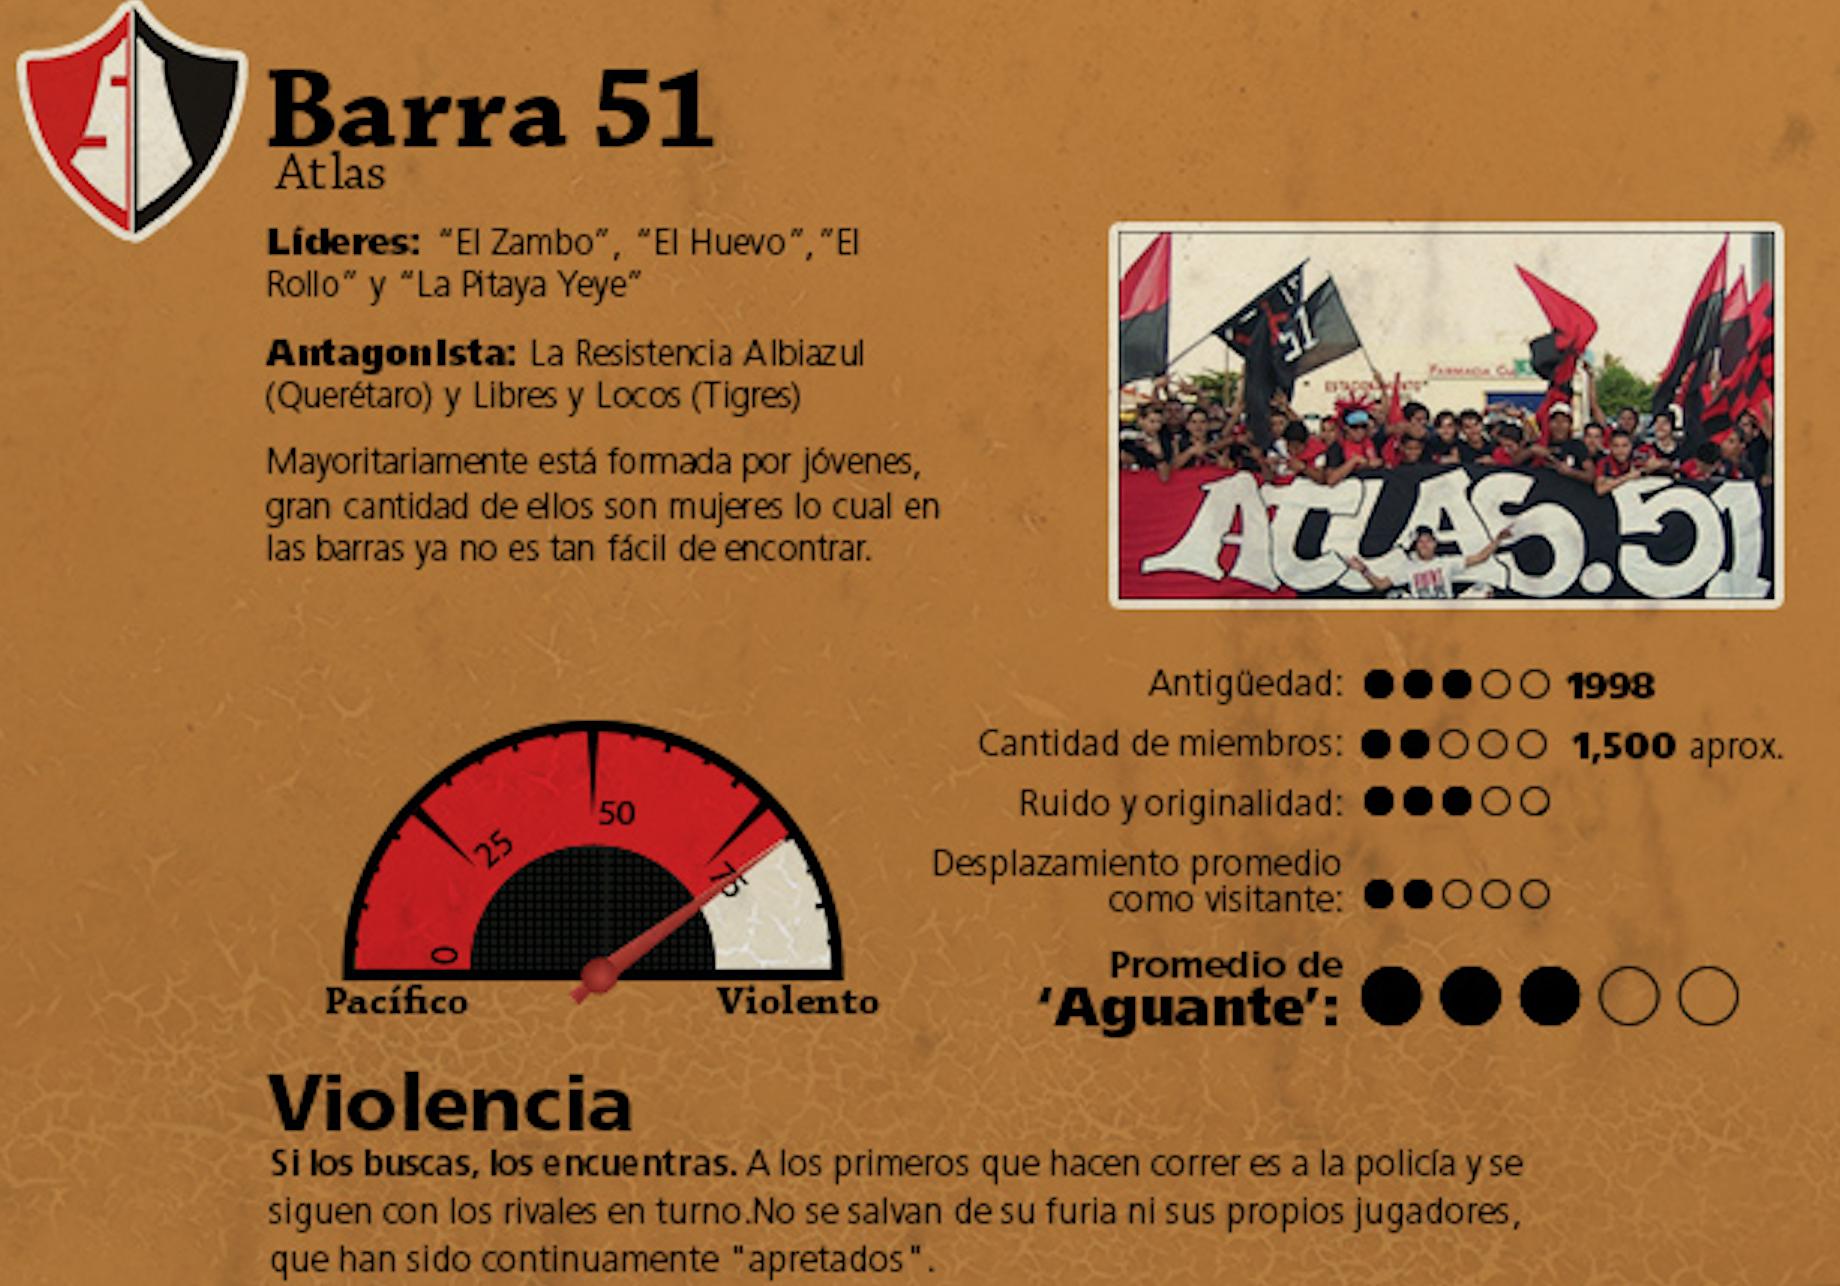 Barra 51